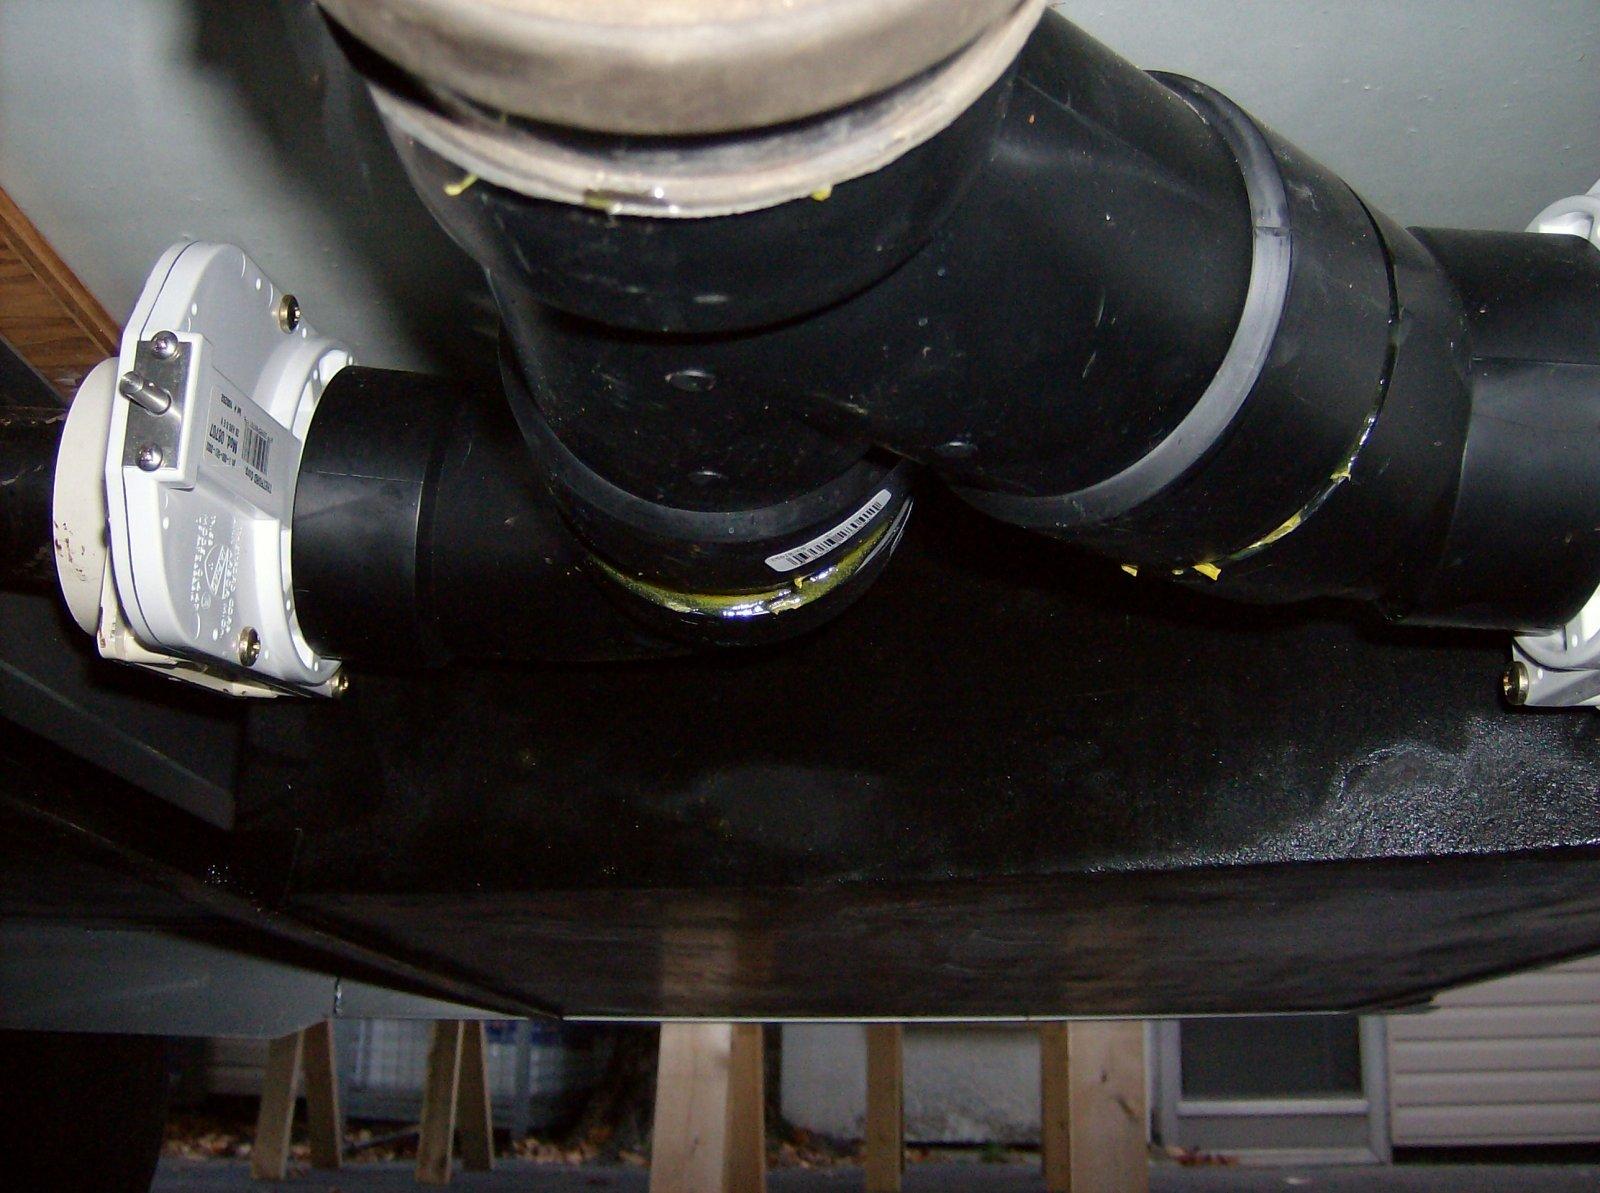 Click image for larger version  Name:Waste valves.jpg Views:67 Size:255.6 KB ID:119075